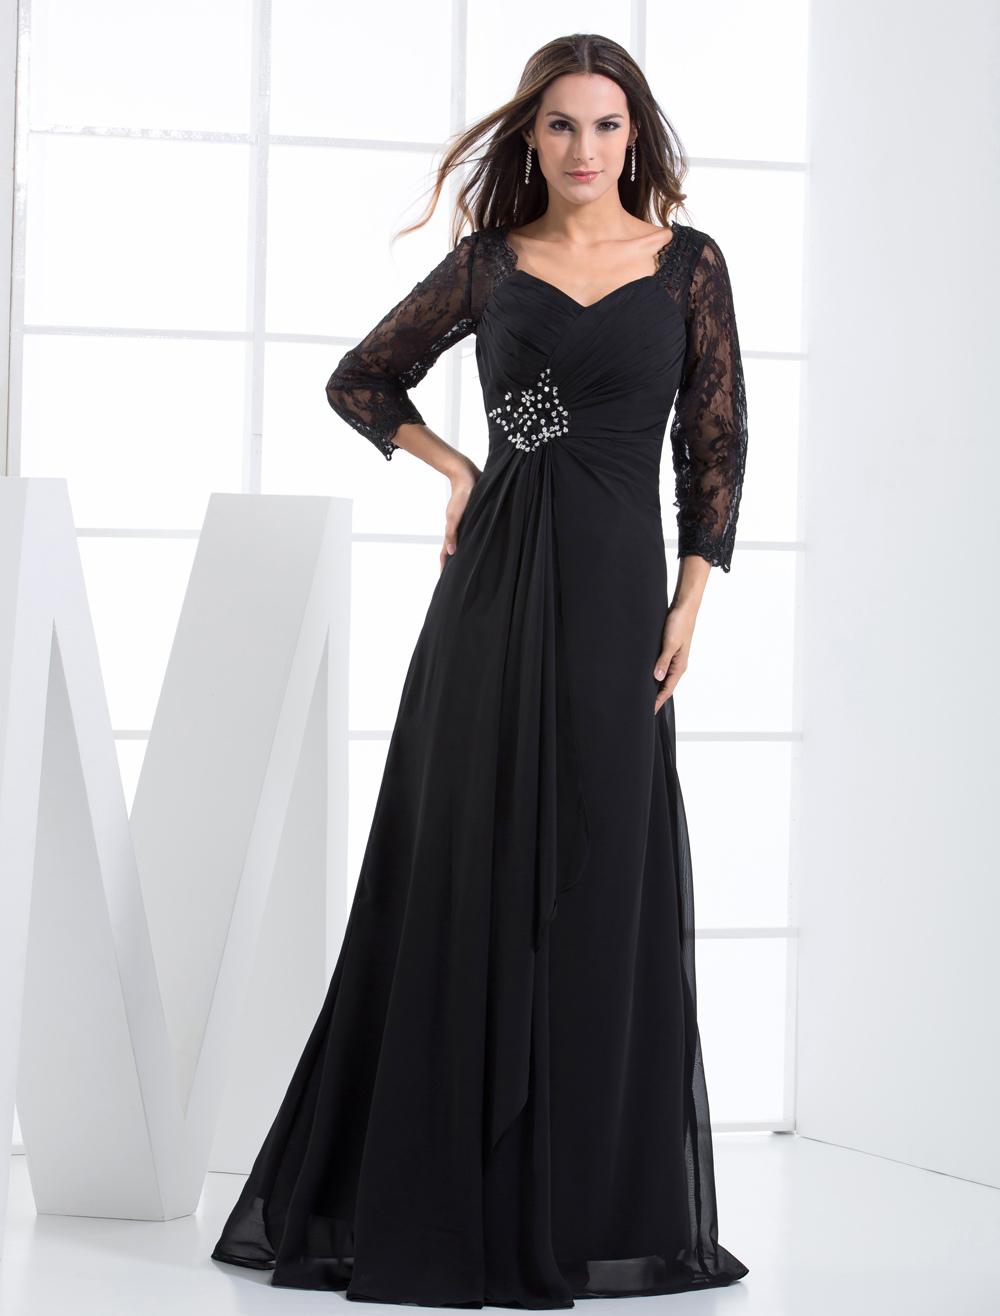 Black Evening Dress Rhinestone Lace Up Chiffon Lace Dress (Wedding Evening Dresses) photo